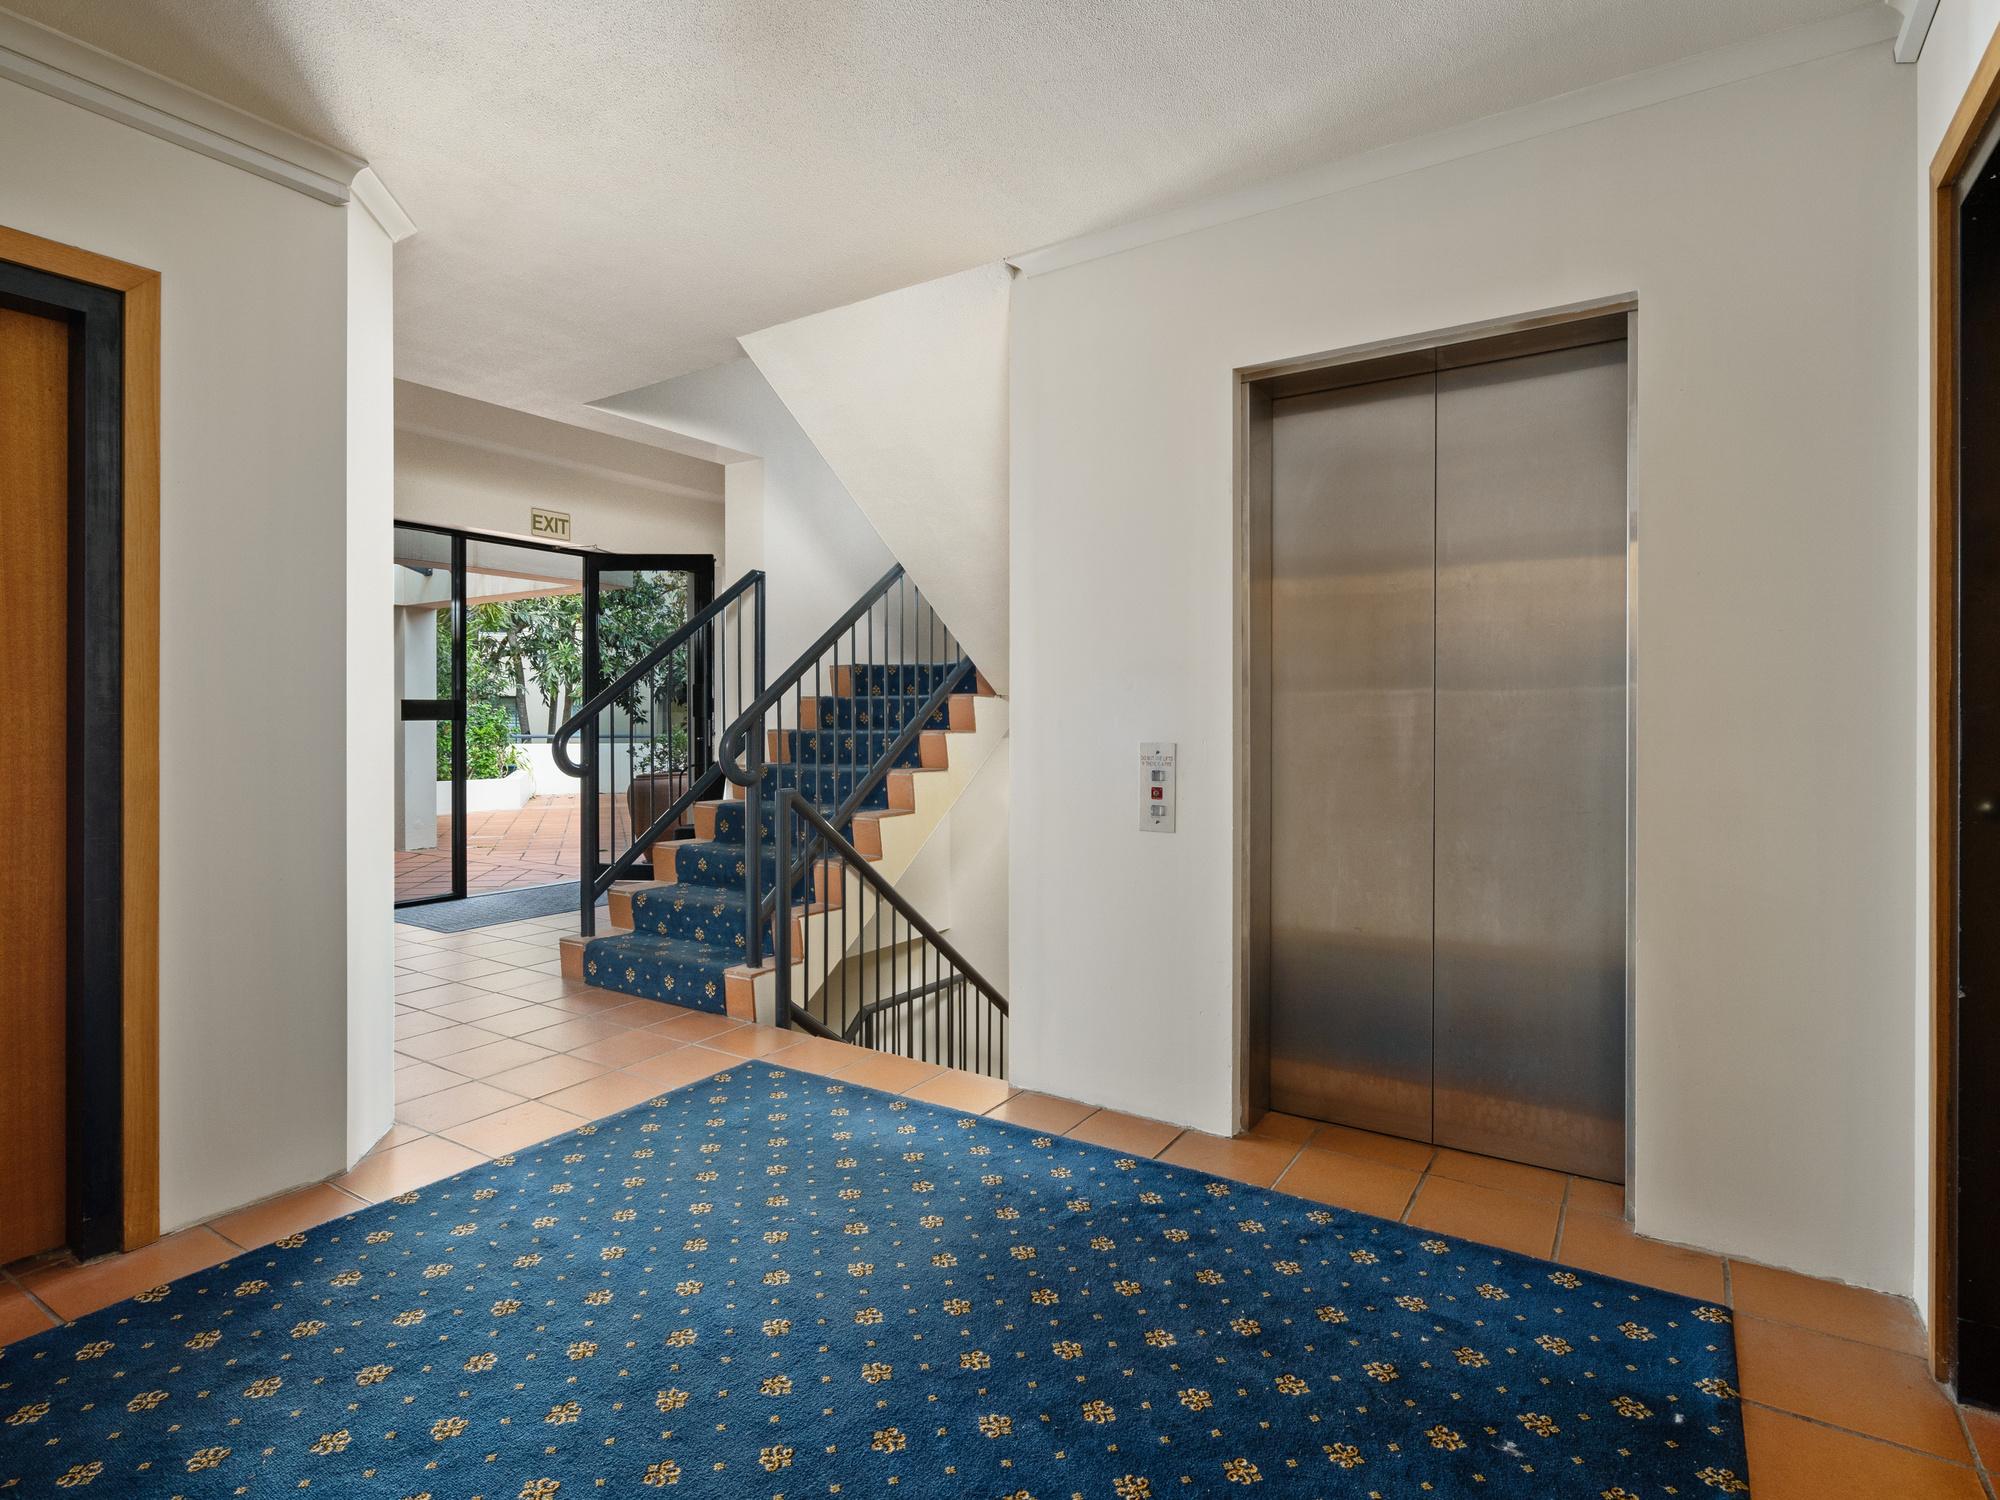 Real Estate | Gold Coast | Chevron Realty | 010 Open2view Id683962 3 10 16 Tarcoola Cresebt